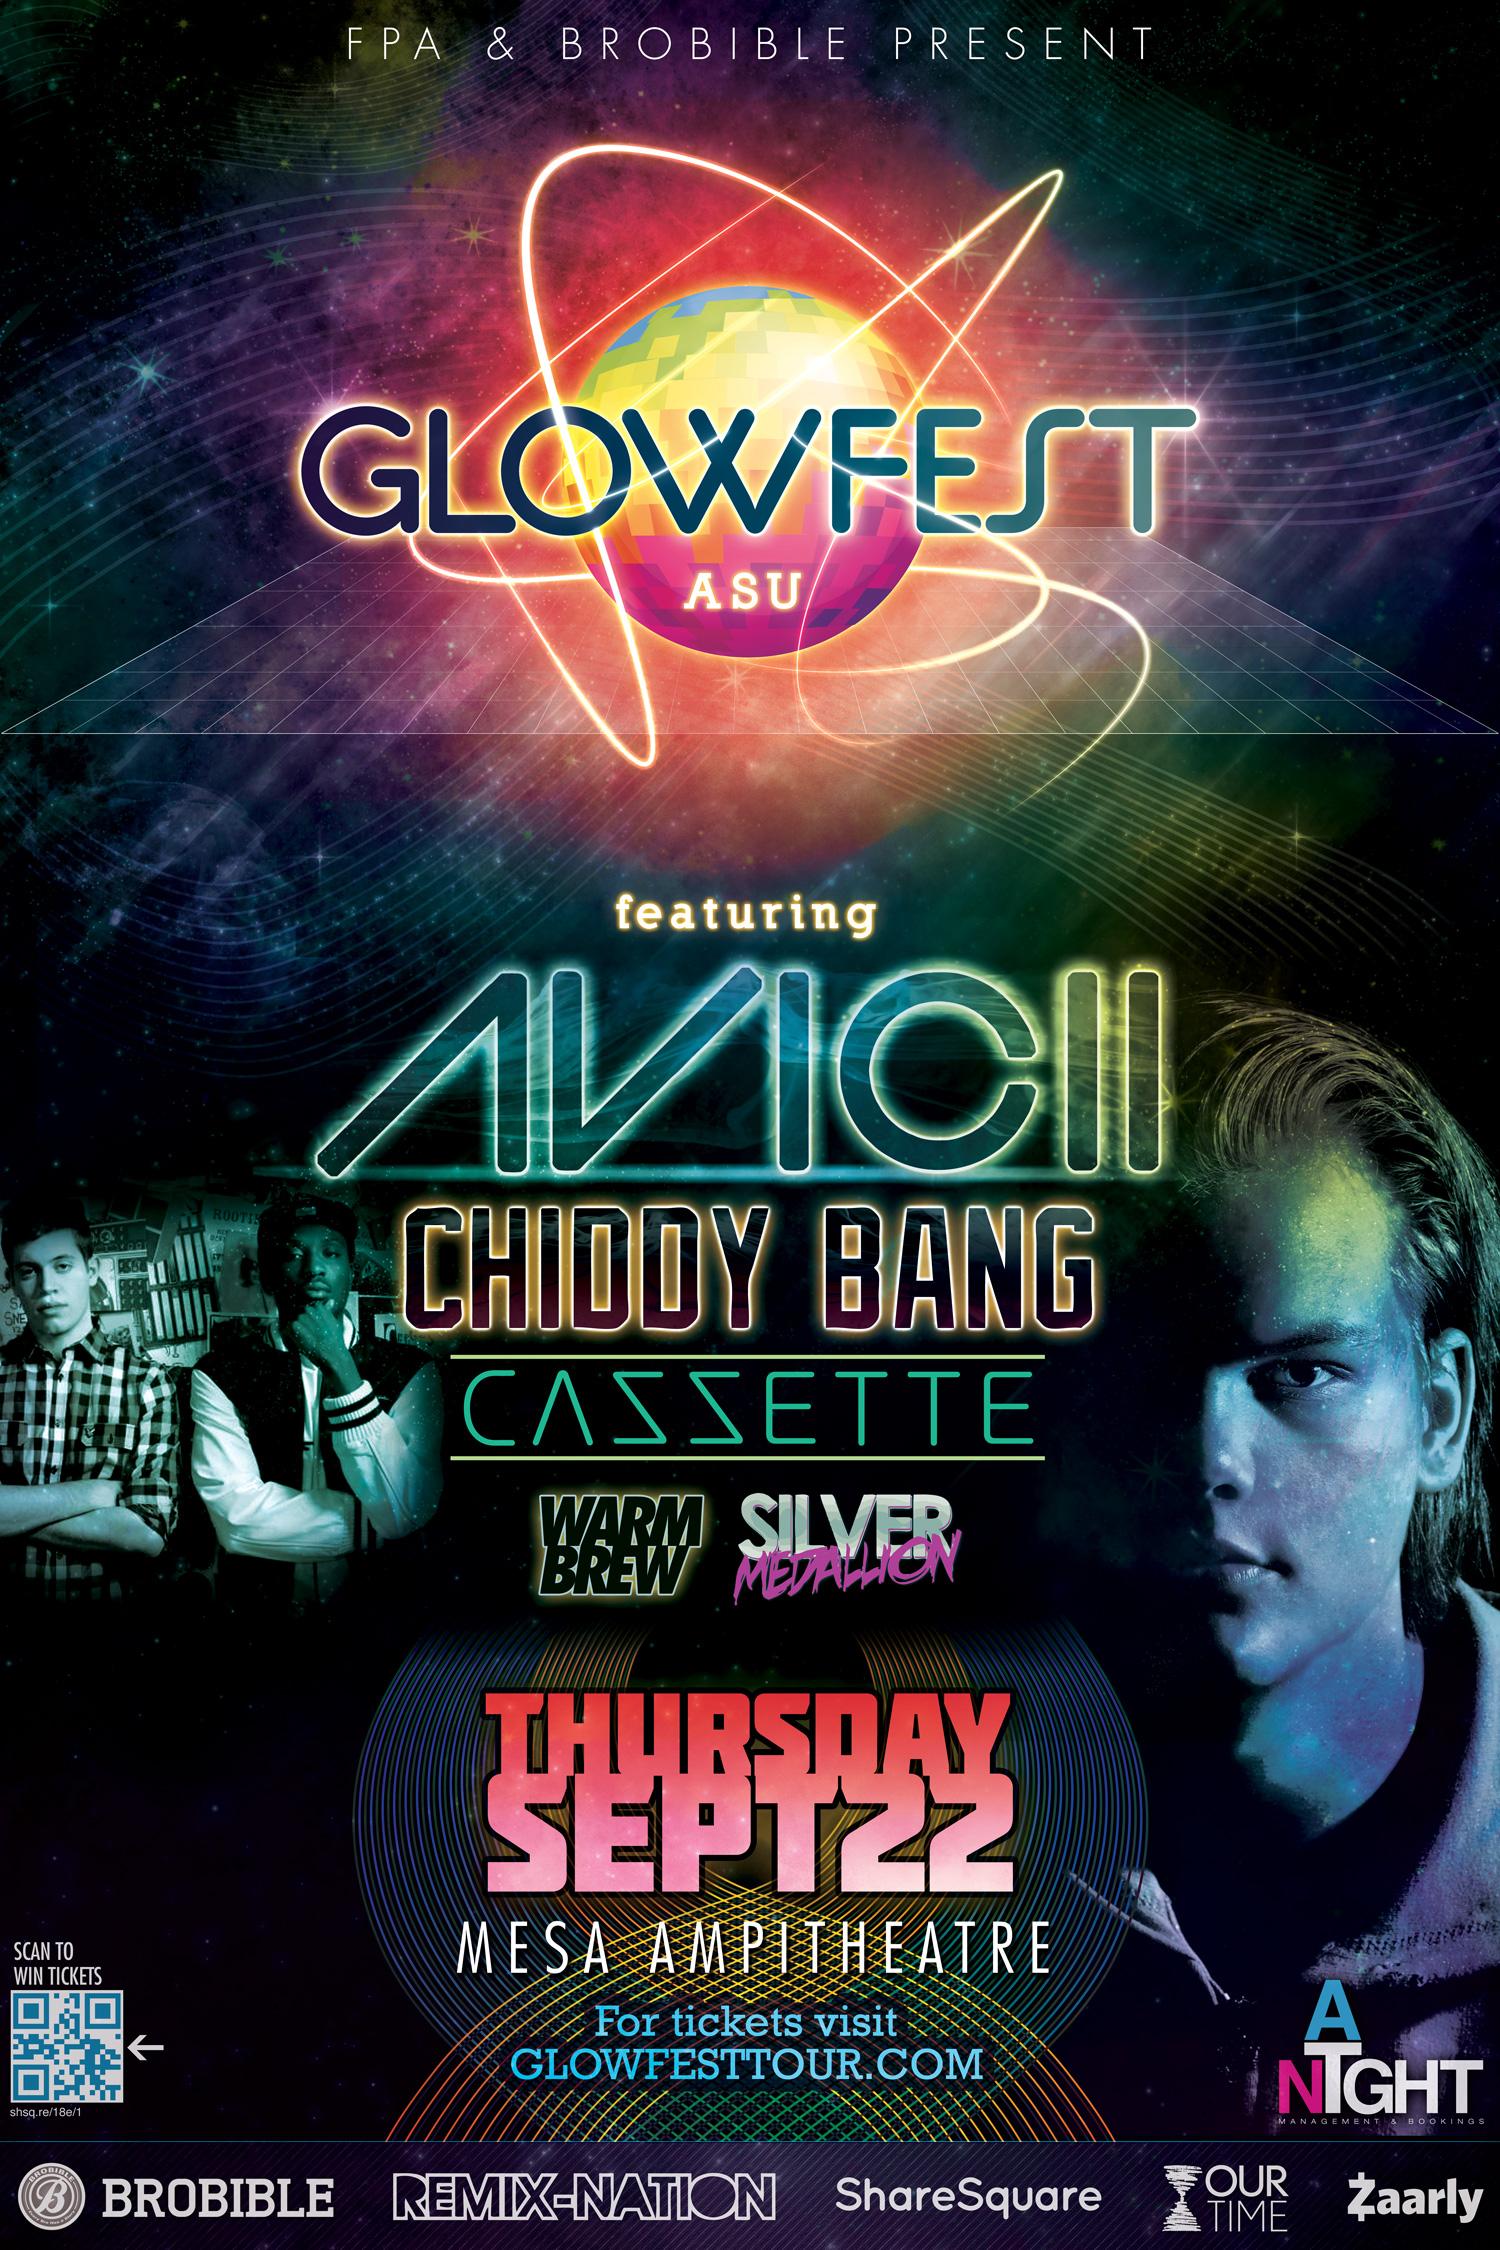 GLOWFEST ASU ft. AVICII on 10/22/11